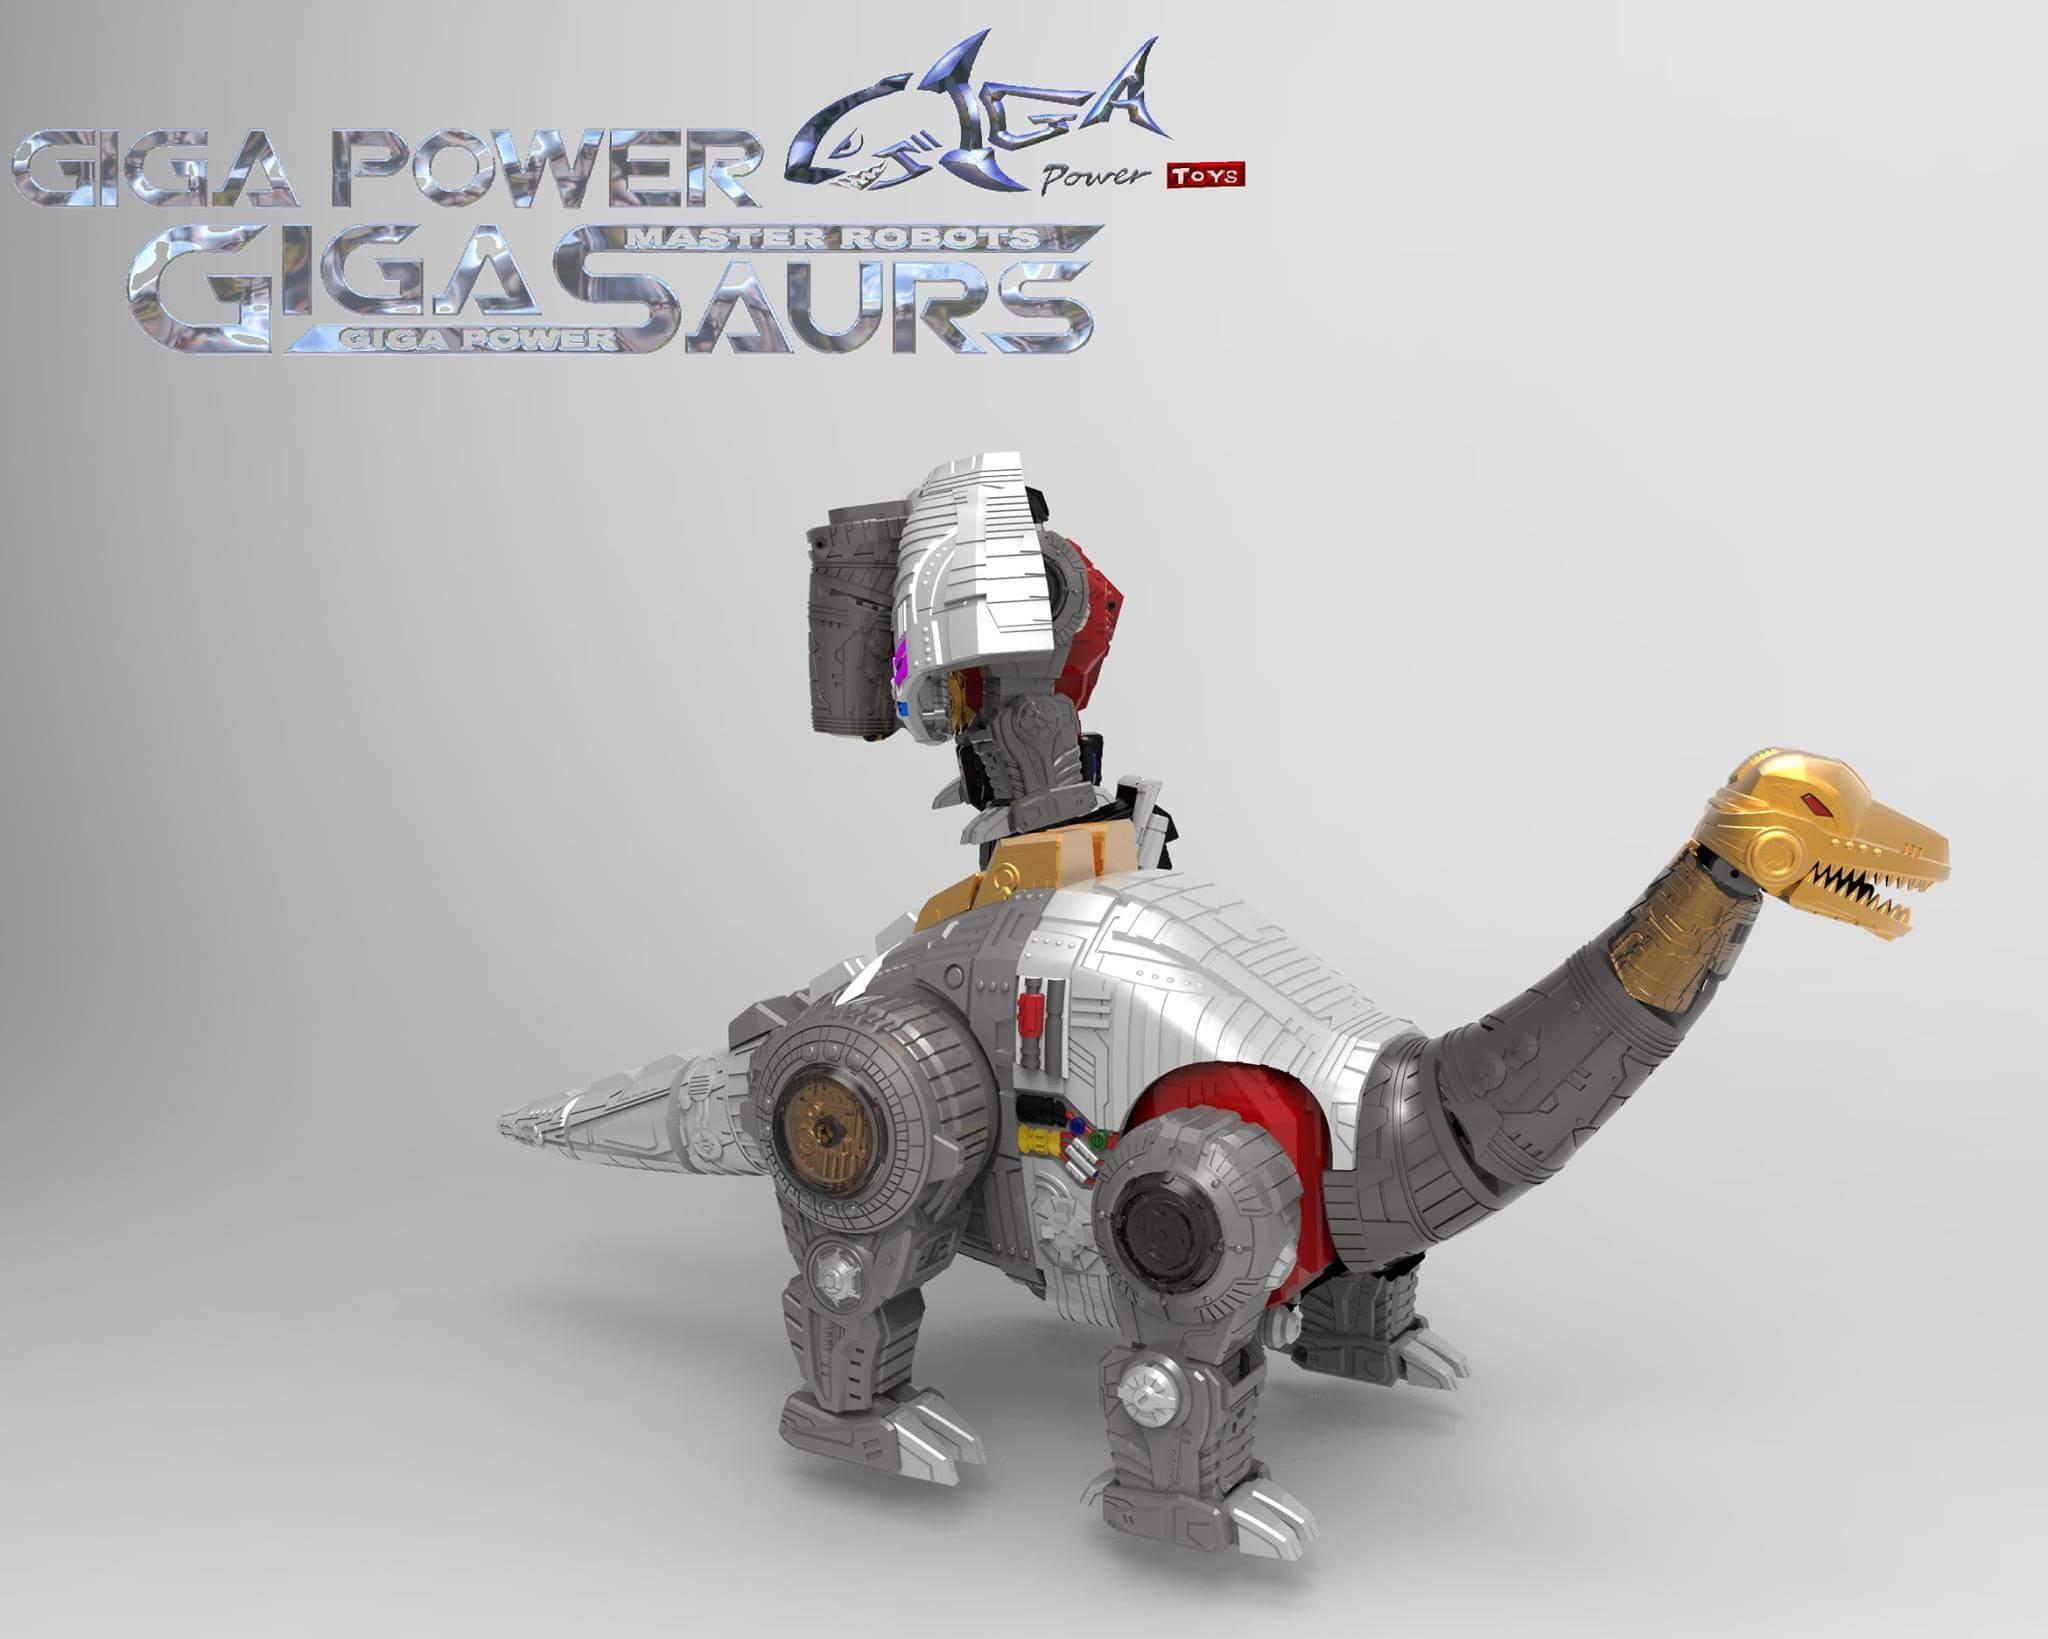 [GigaPower] Produit Tiers - Jouets HQ-01 Superator + HQ-02 Grassor + HQ-03 Guttur + HQ-04 Graviter + HQ-05 Gaudenter - aka Dinobots - Page 5 T2DfP3yC